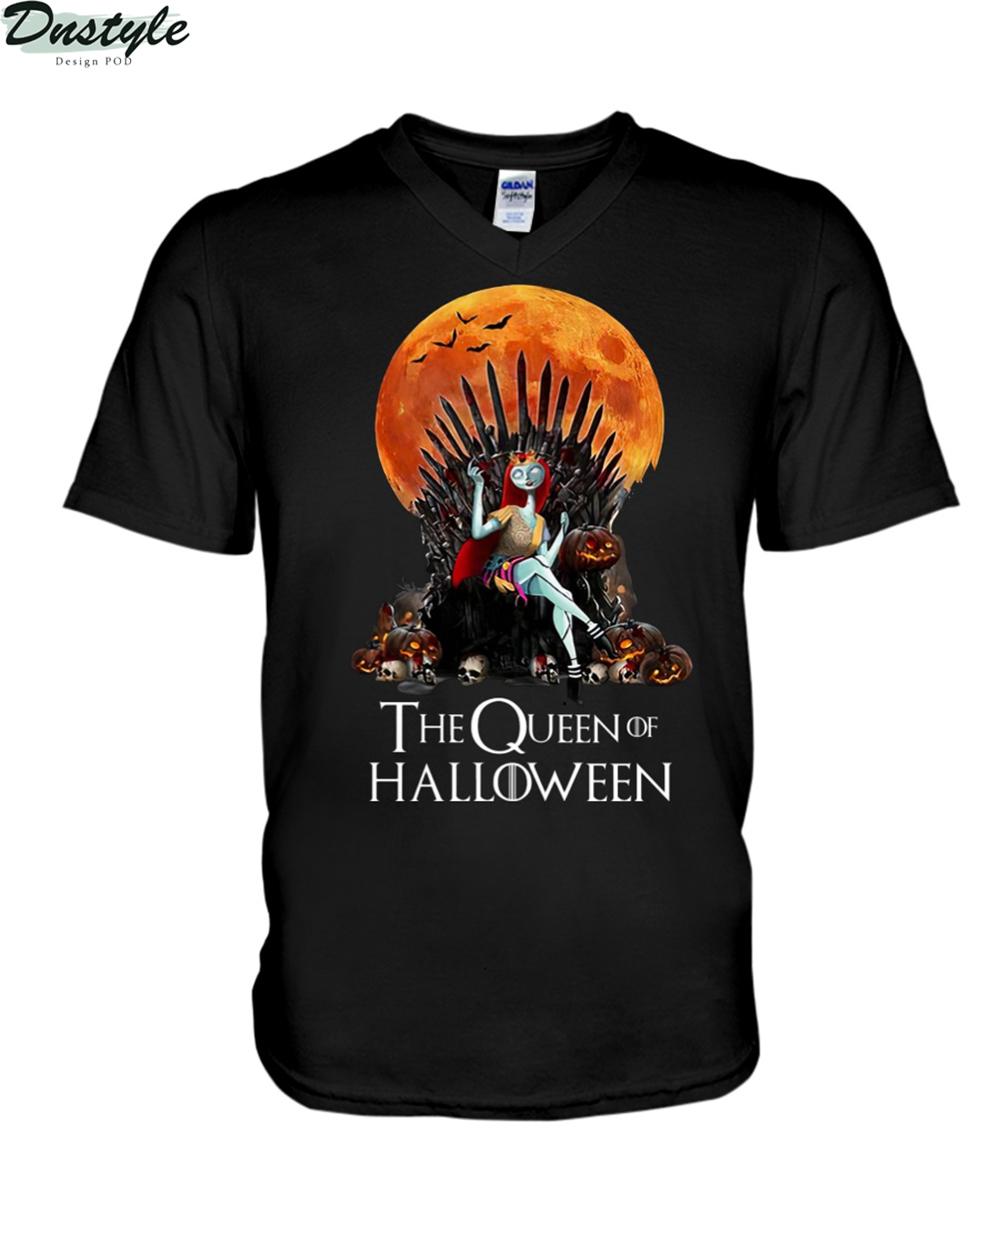 Sally the queen of halloween v-neck